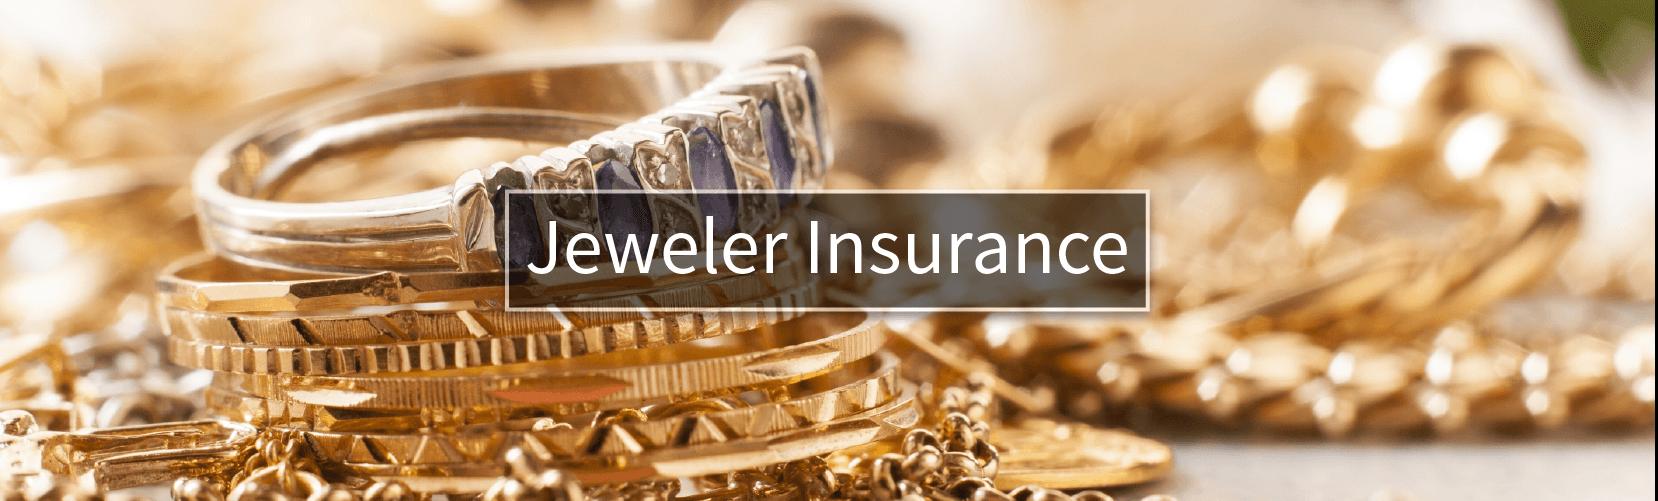 Jeweler Insurance Massachusetts